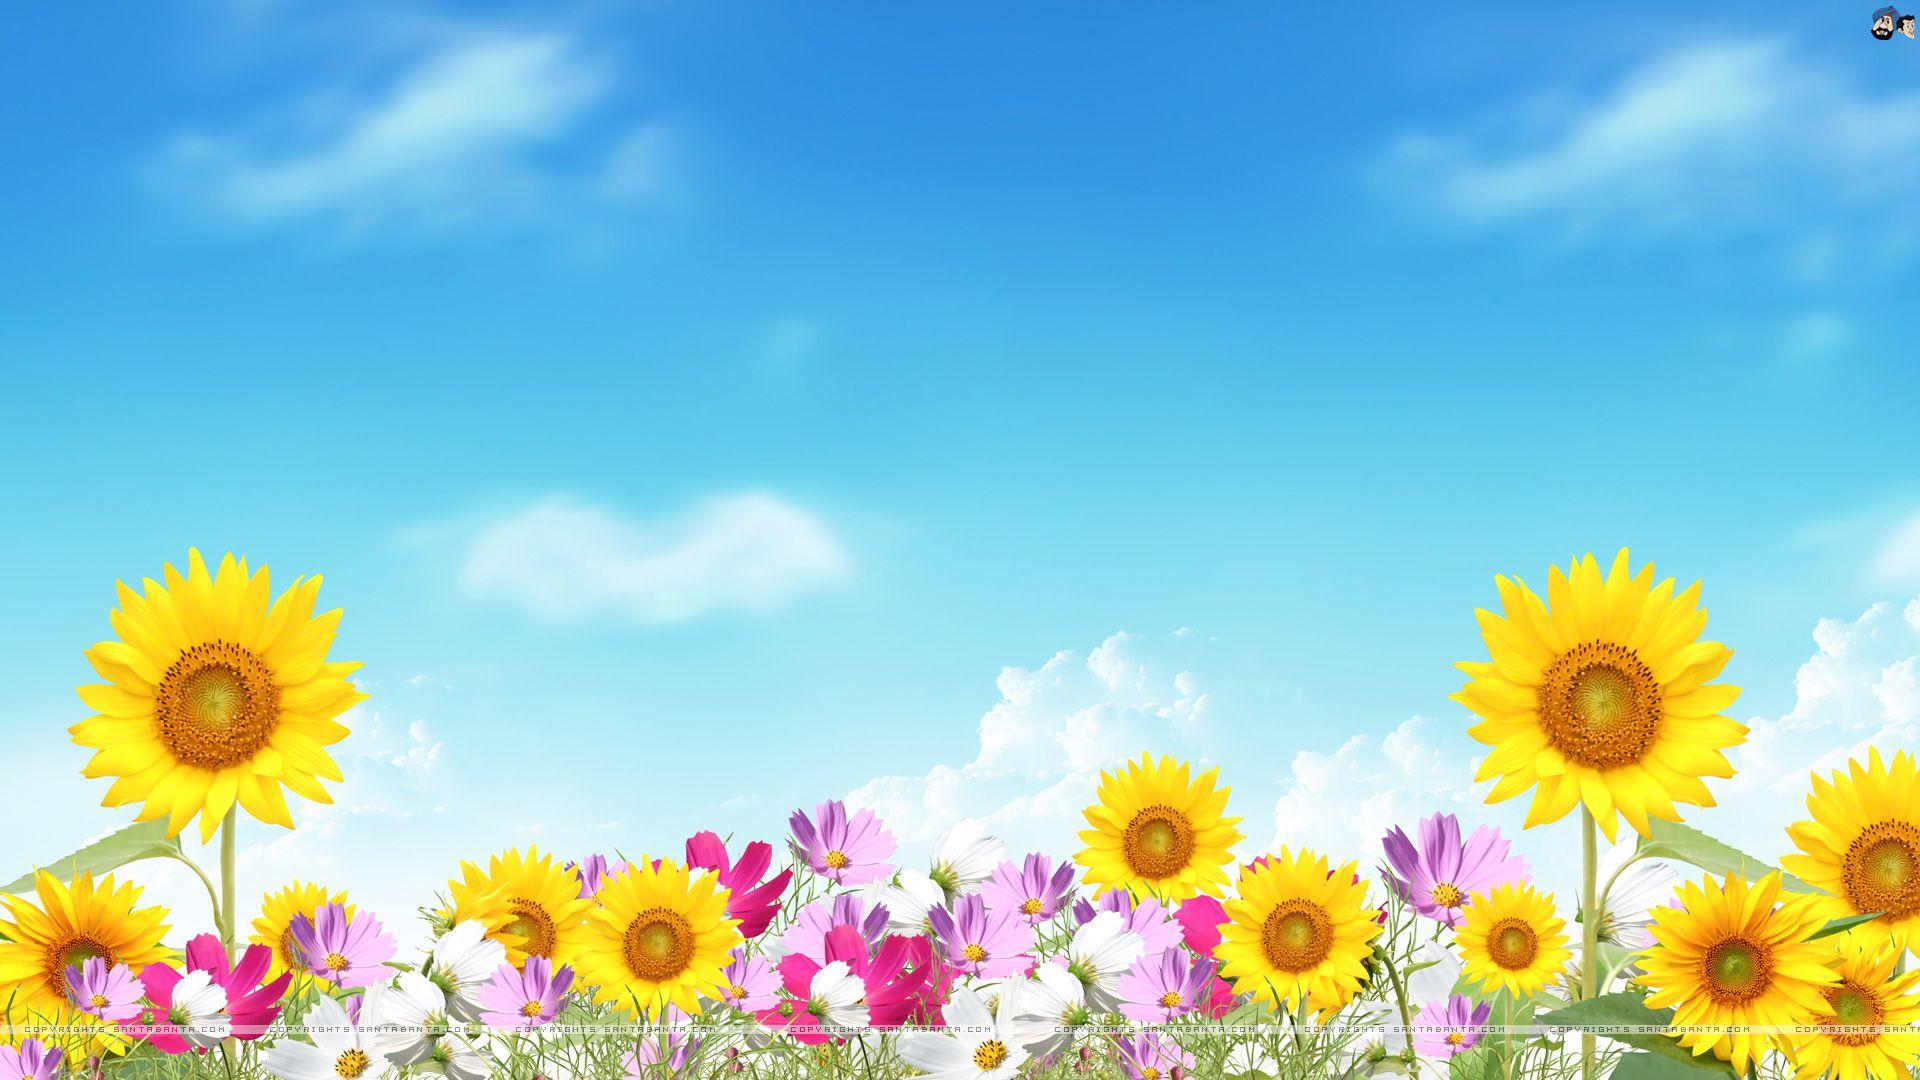 Image for Summer Flowers Computer Backgrounds Desktop 1920x1080